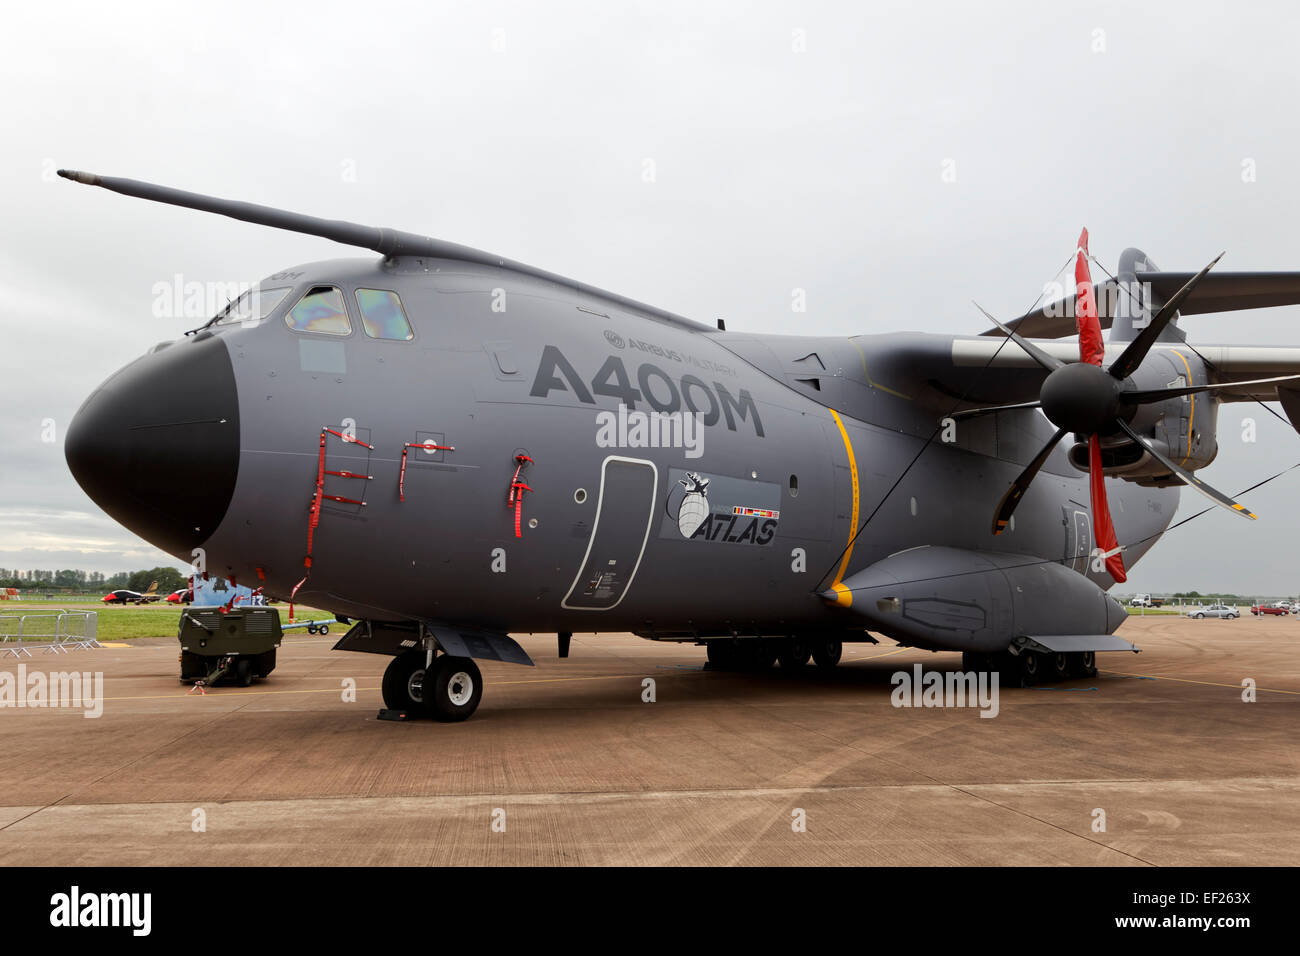 A Royal Air Force Airbus Military A400M Atlas transport aircraft at the 2012 Royal International Air Tattoo, RAF - Stock Image